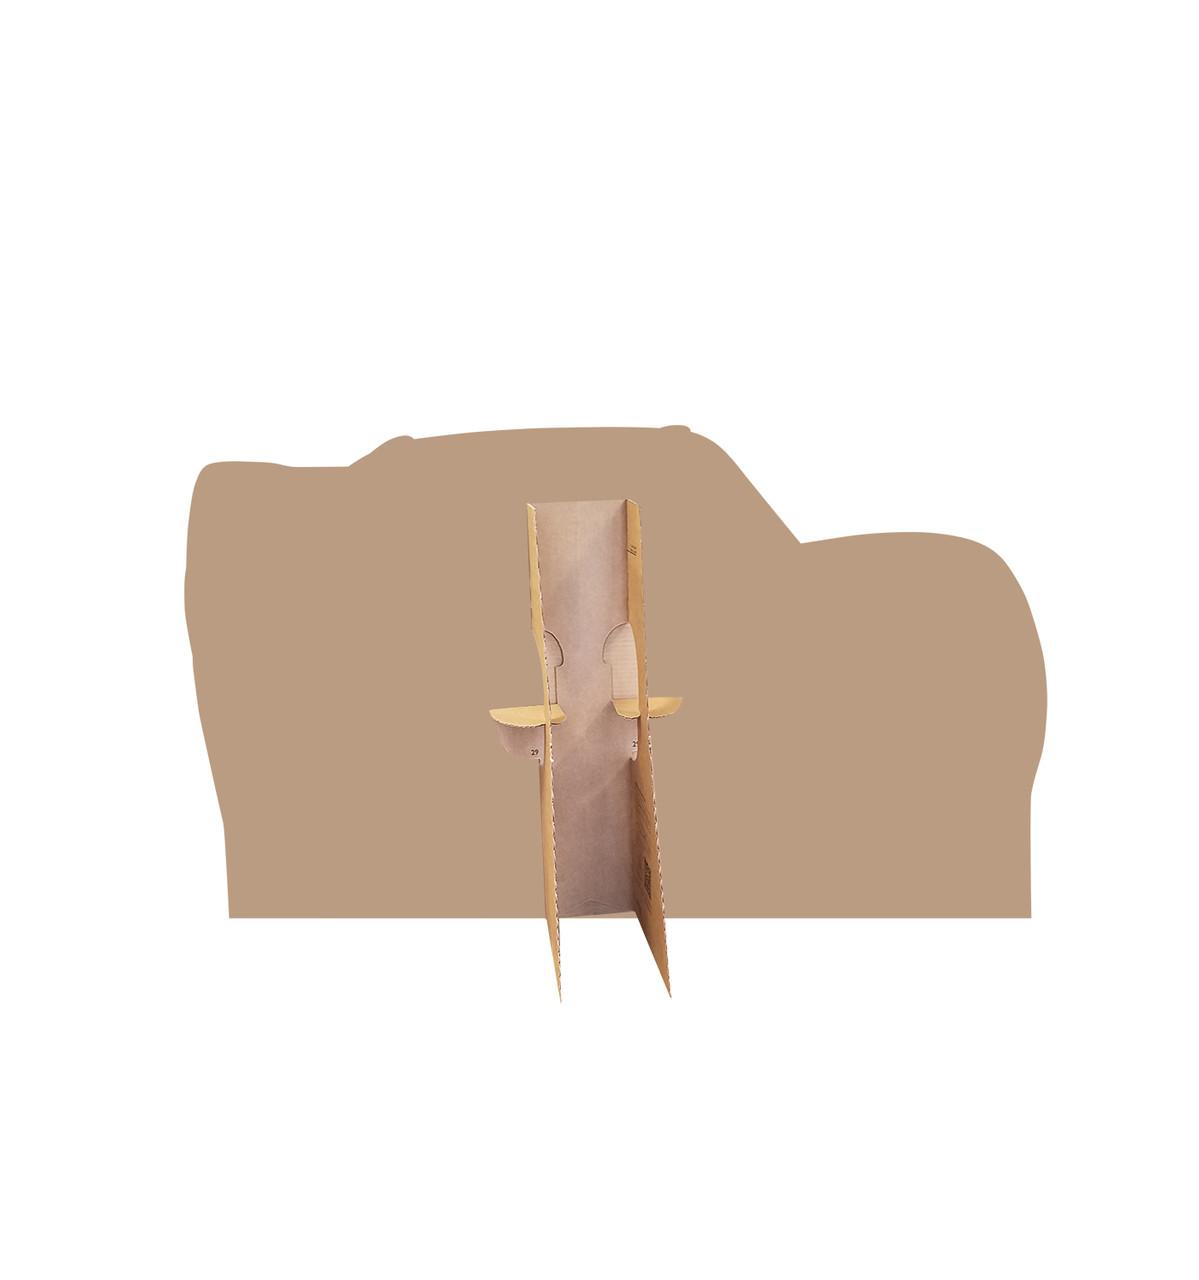 Fabulous Lightning McQueen Cardboard Standup 2